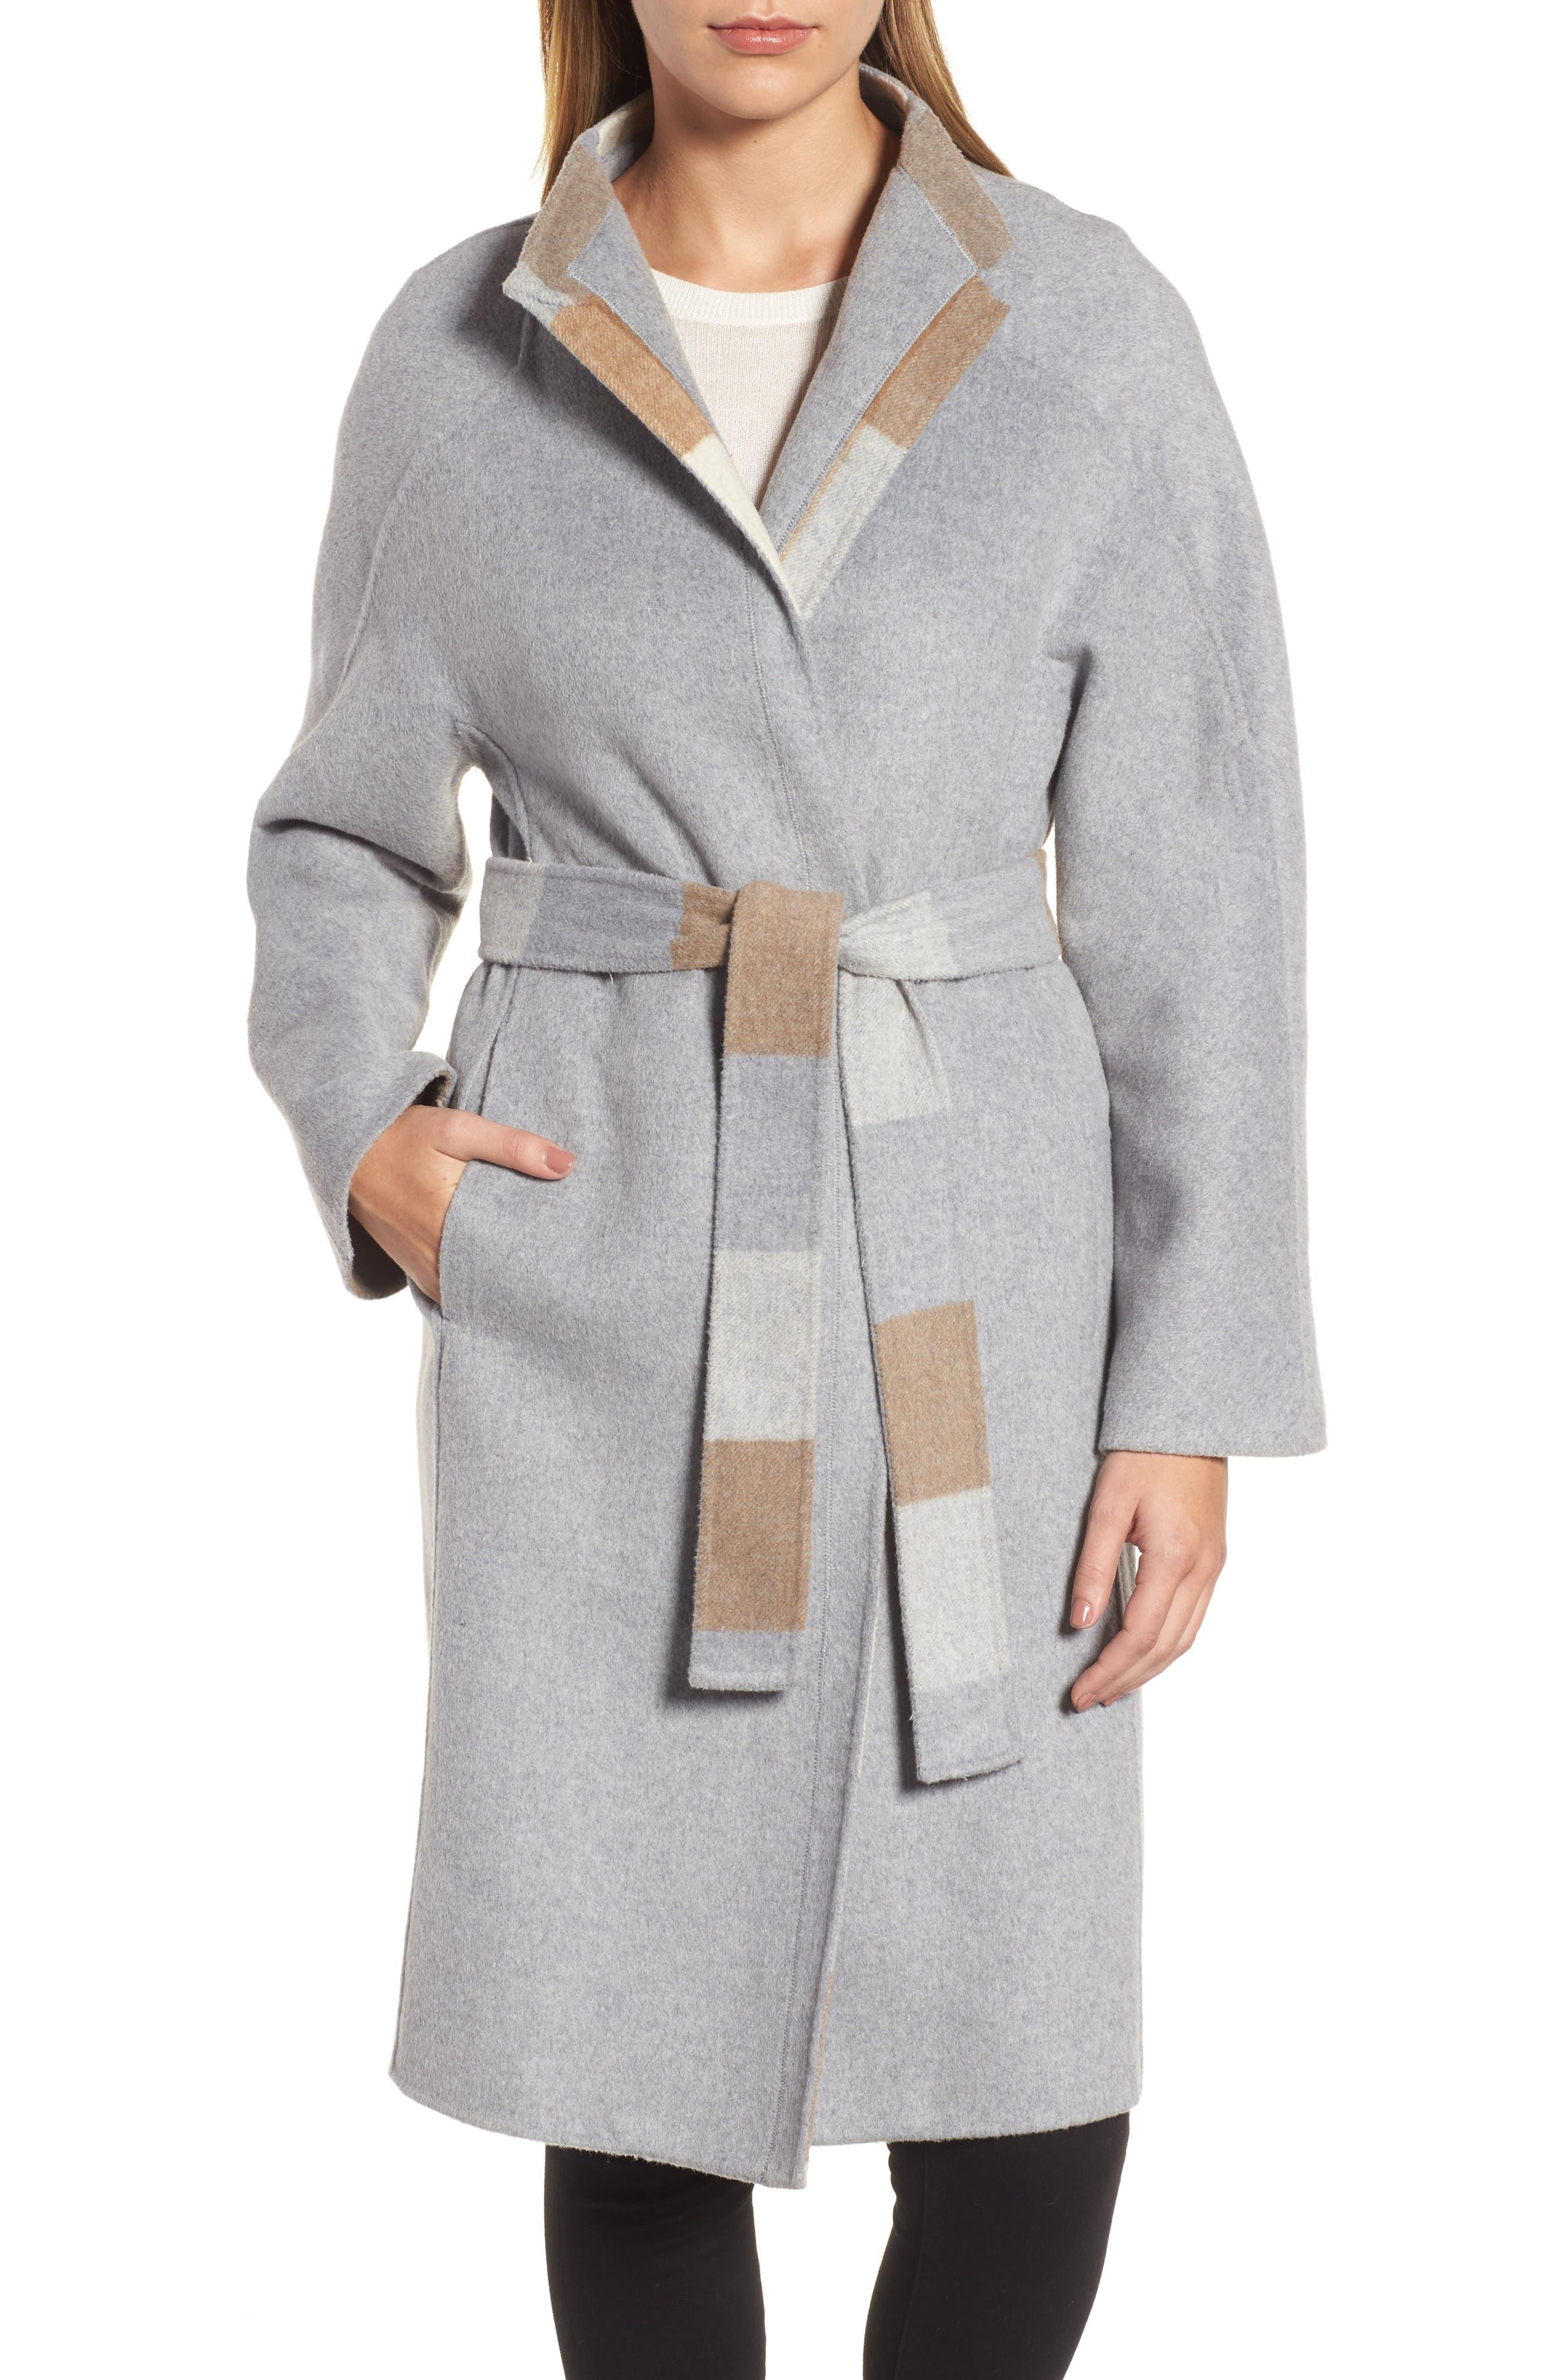 DKNY Wool Blend Wrap Coat,                             Main thumbnail 1, color,